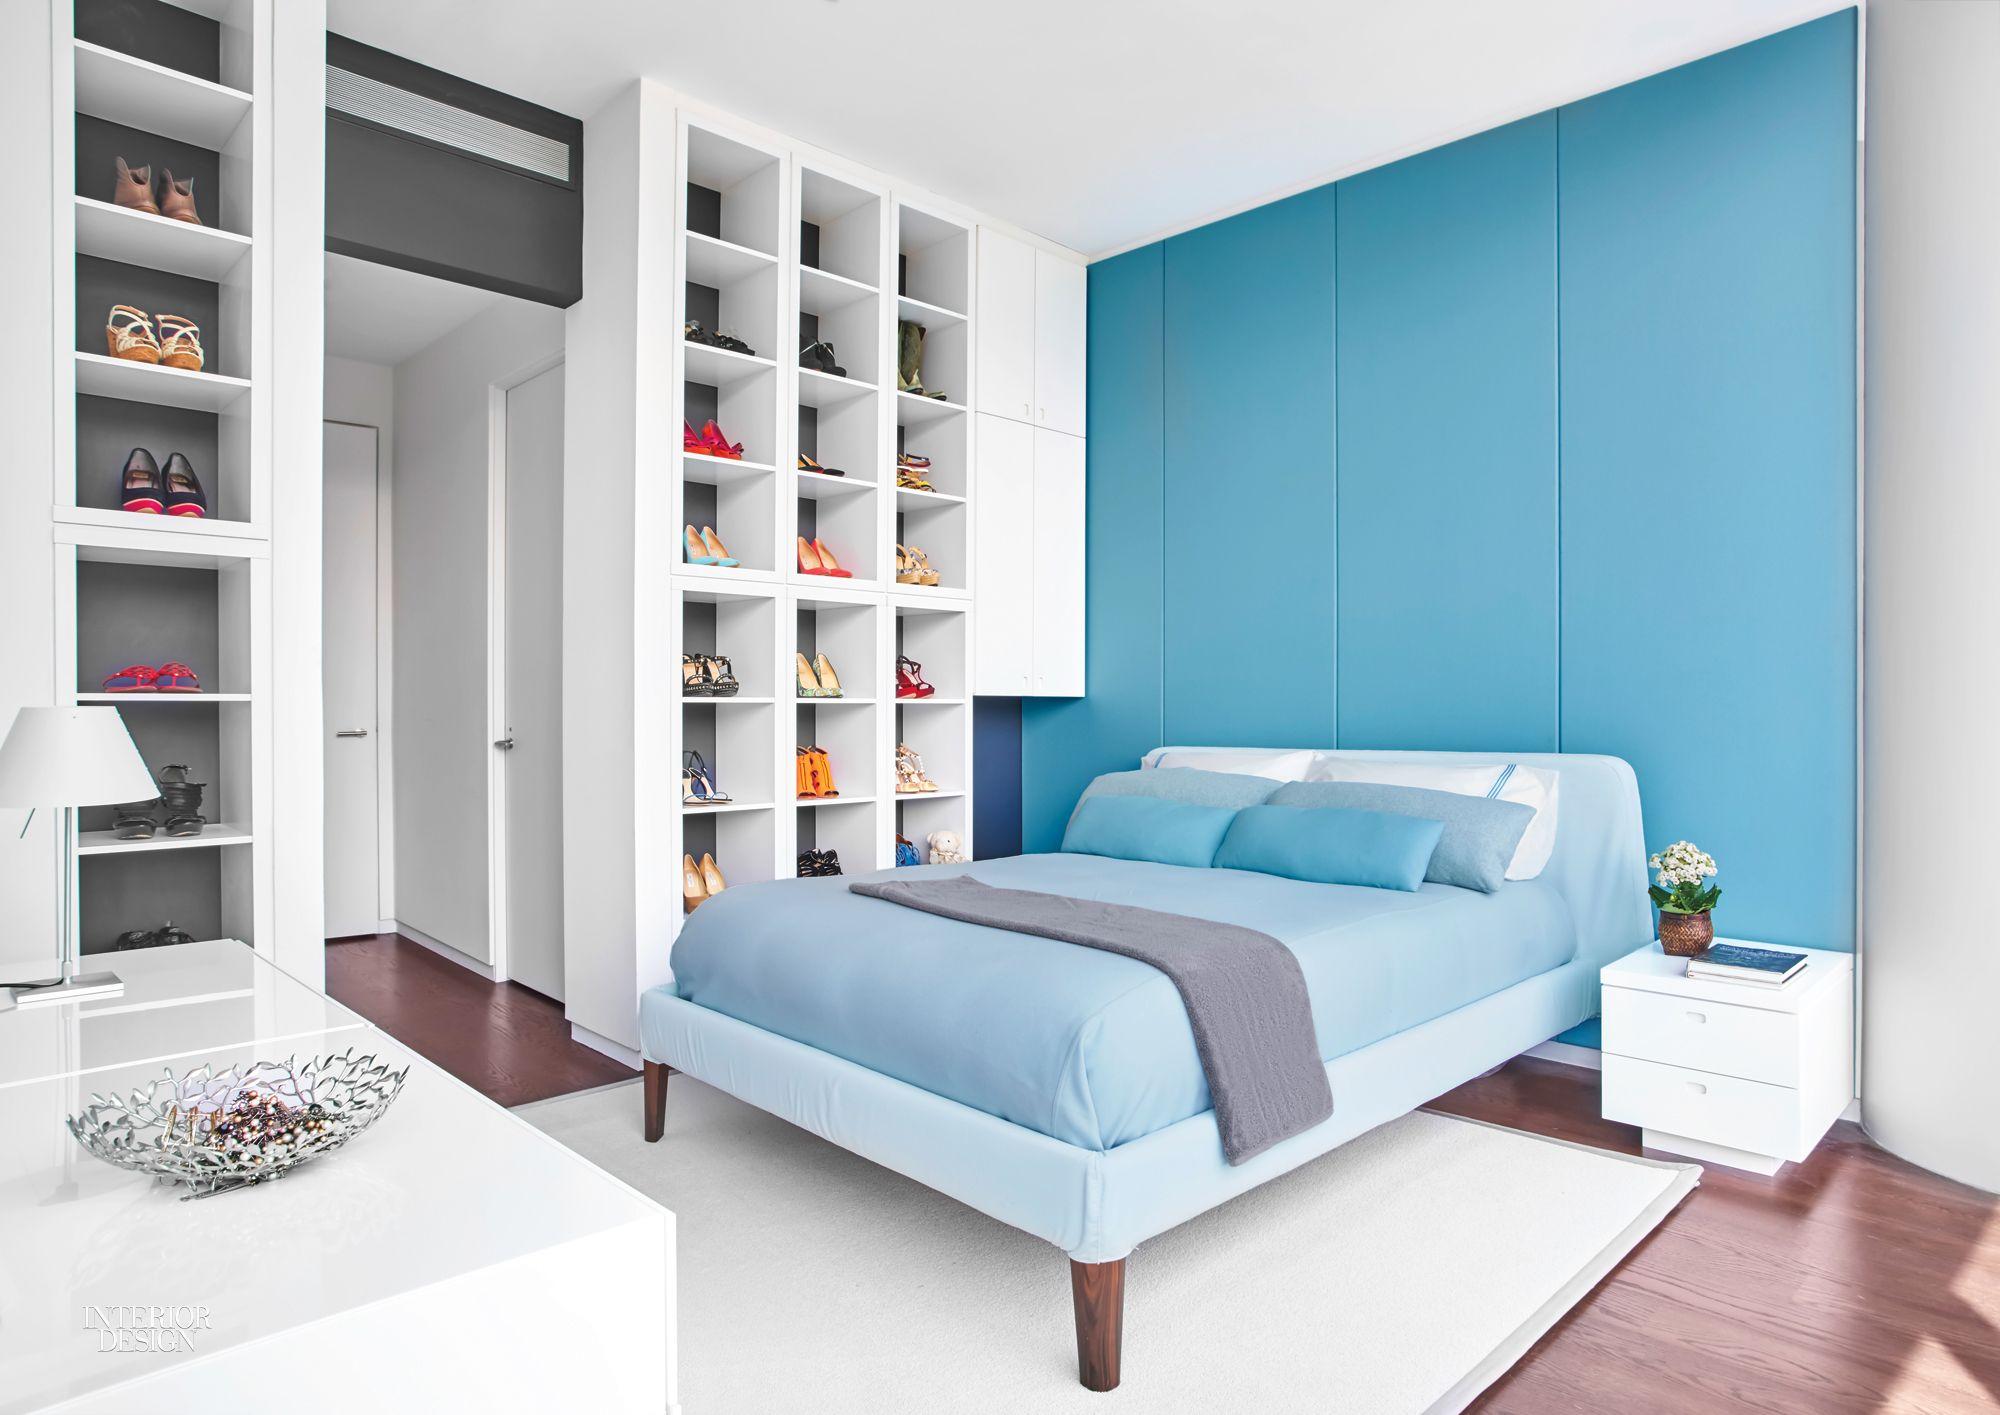 RDK Design Updates a Chicago HighRise Apartment